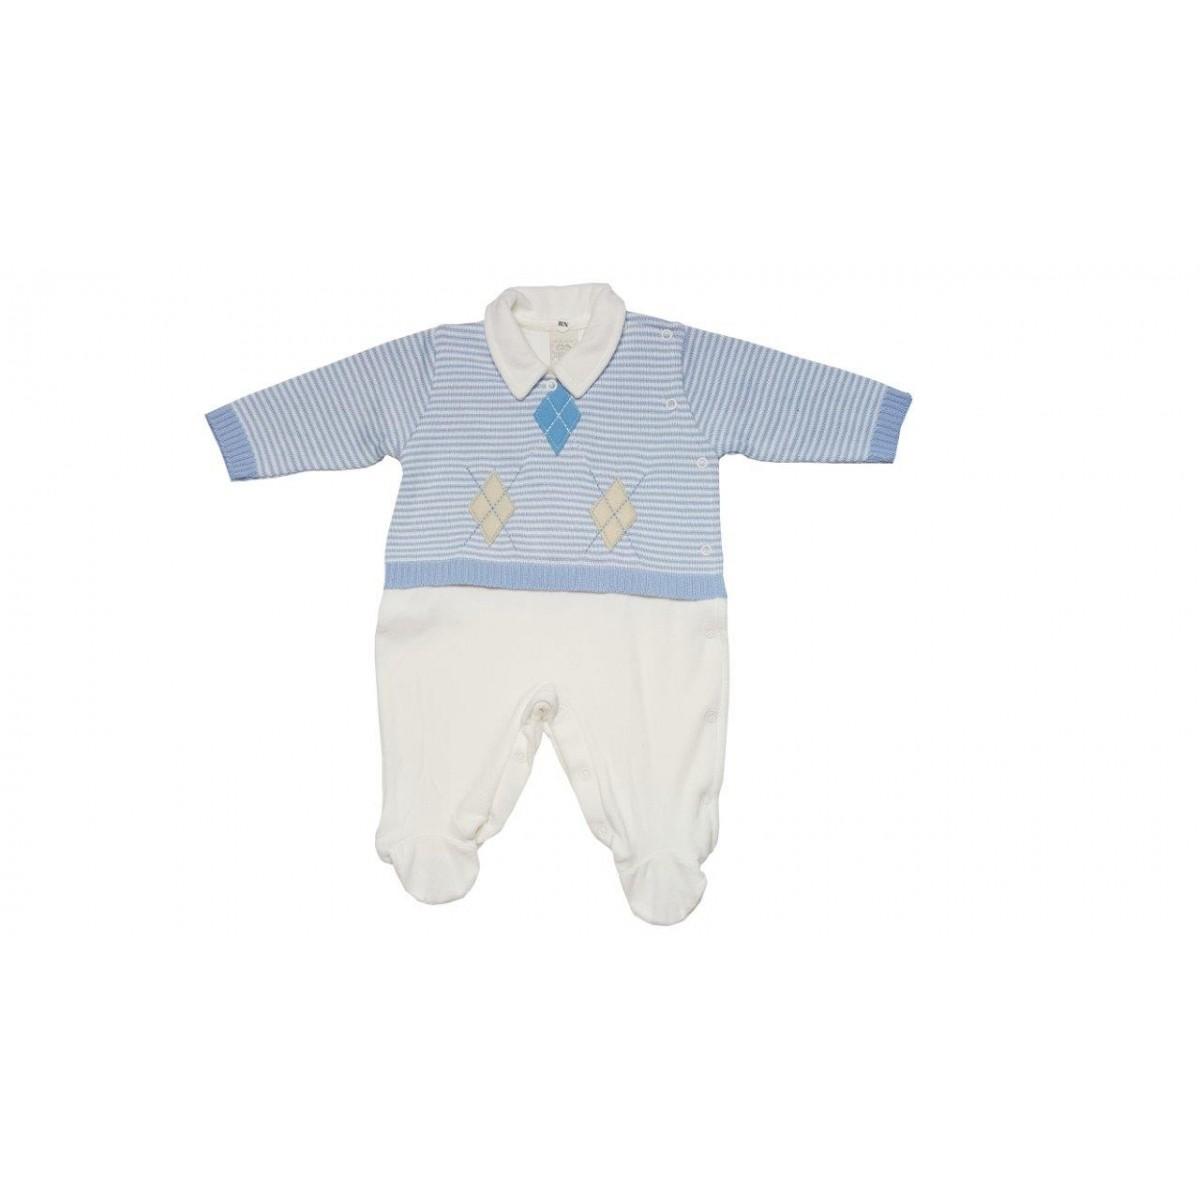 Macacão Milly Baby  Losangolo  / Tamanho RN